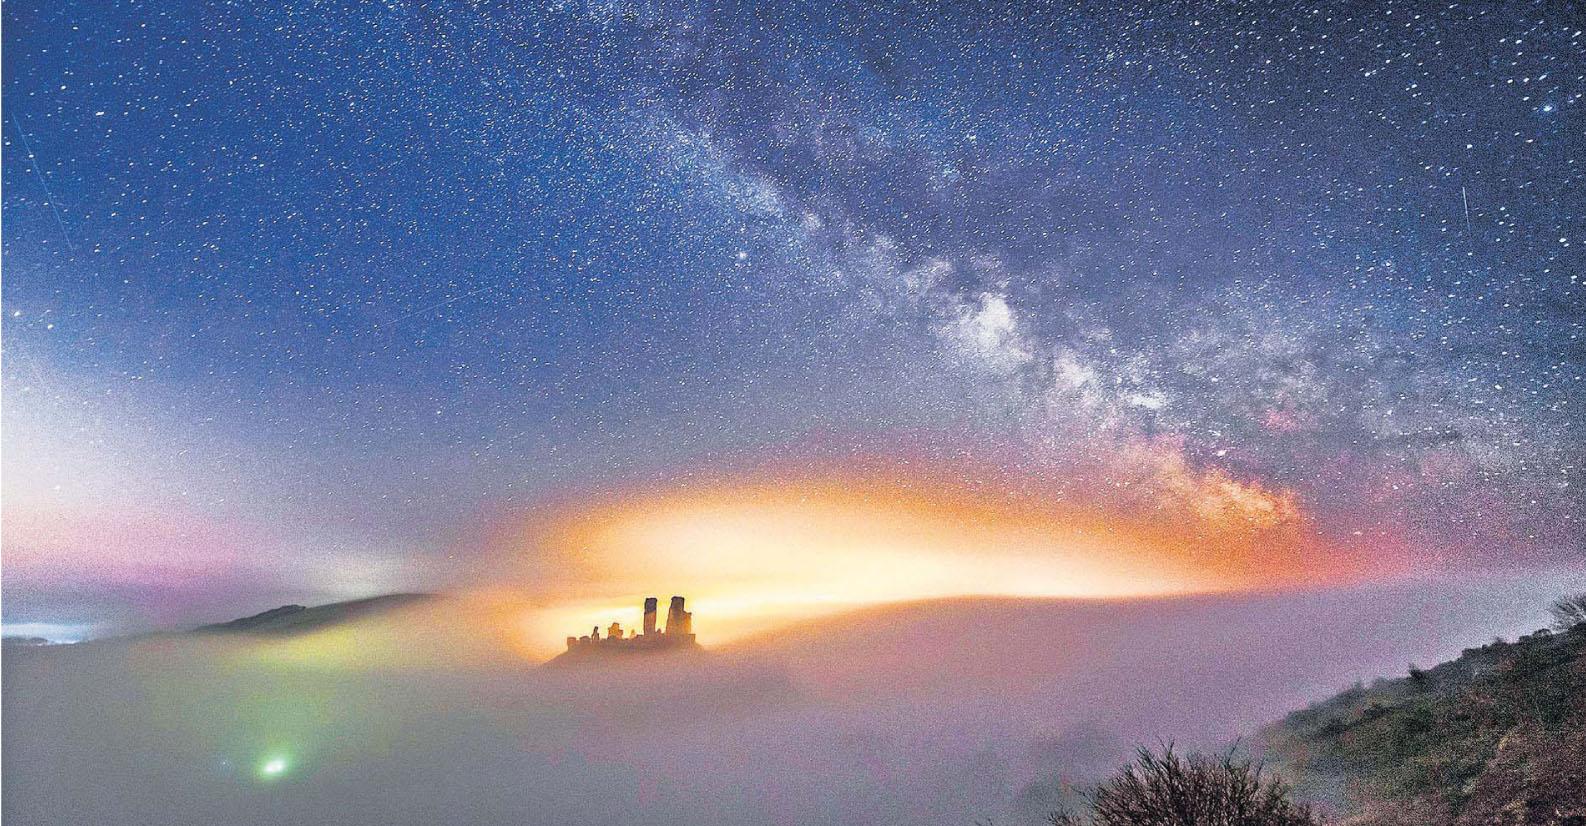 The Milky Way above Corfe Castle, Dorset by Graham Hunt.jpg